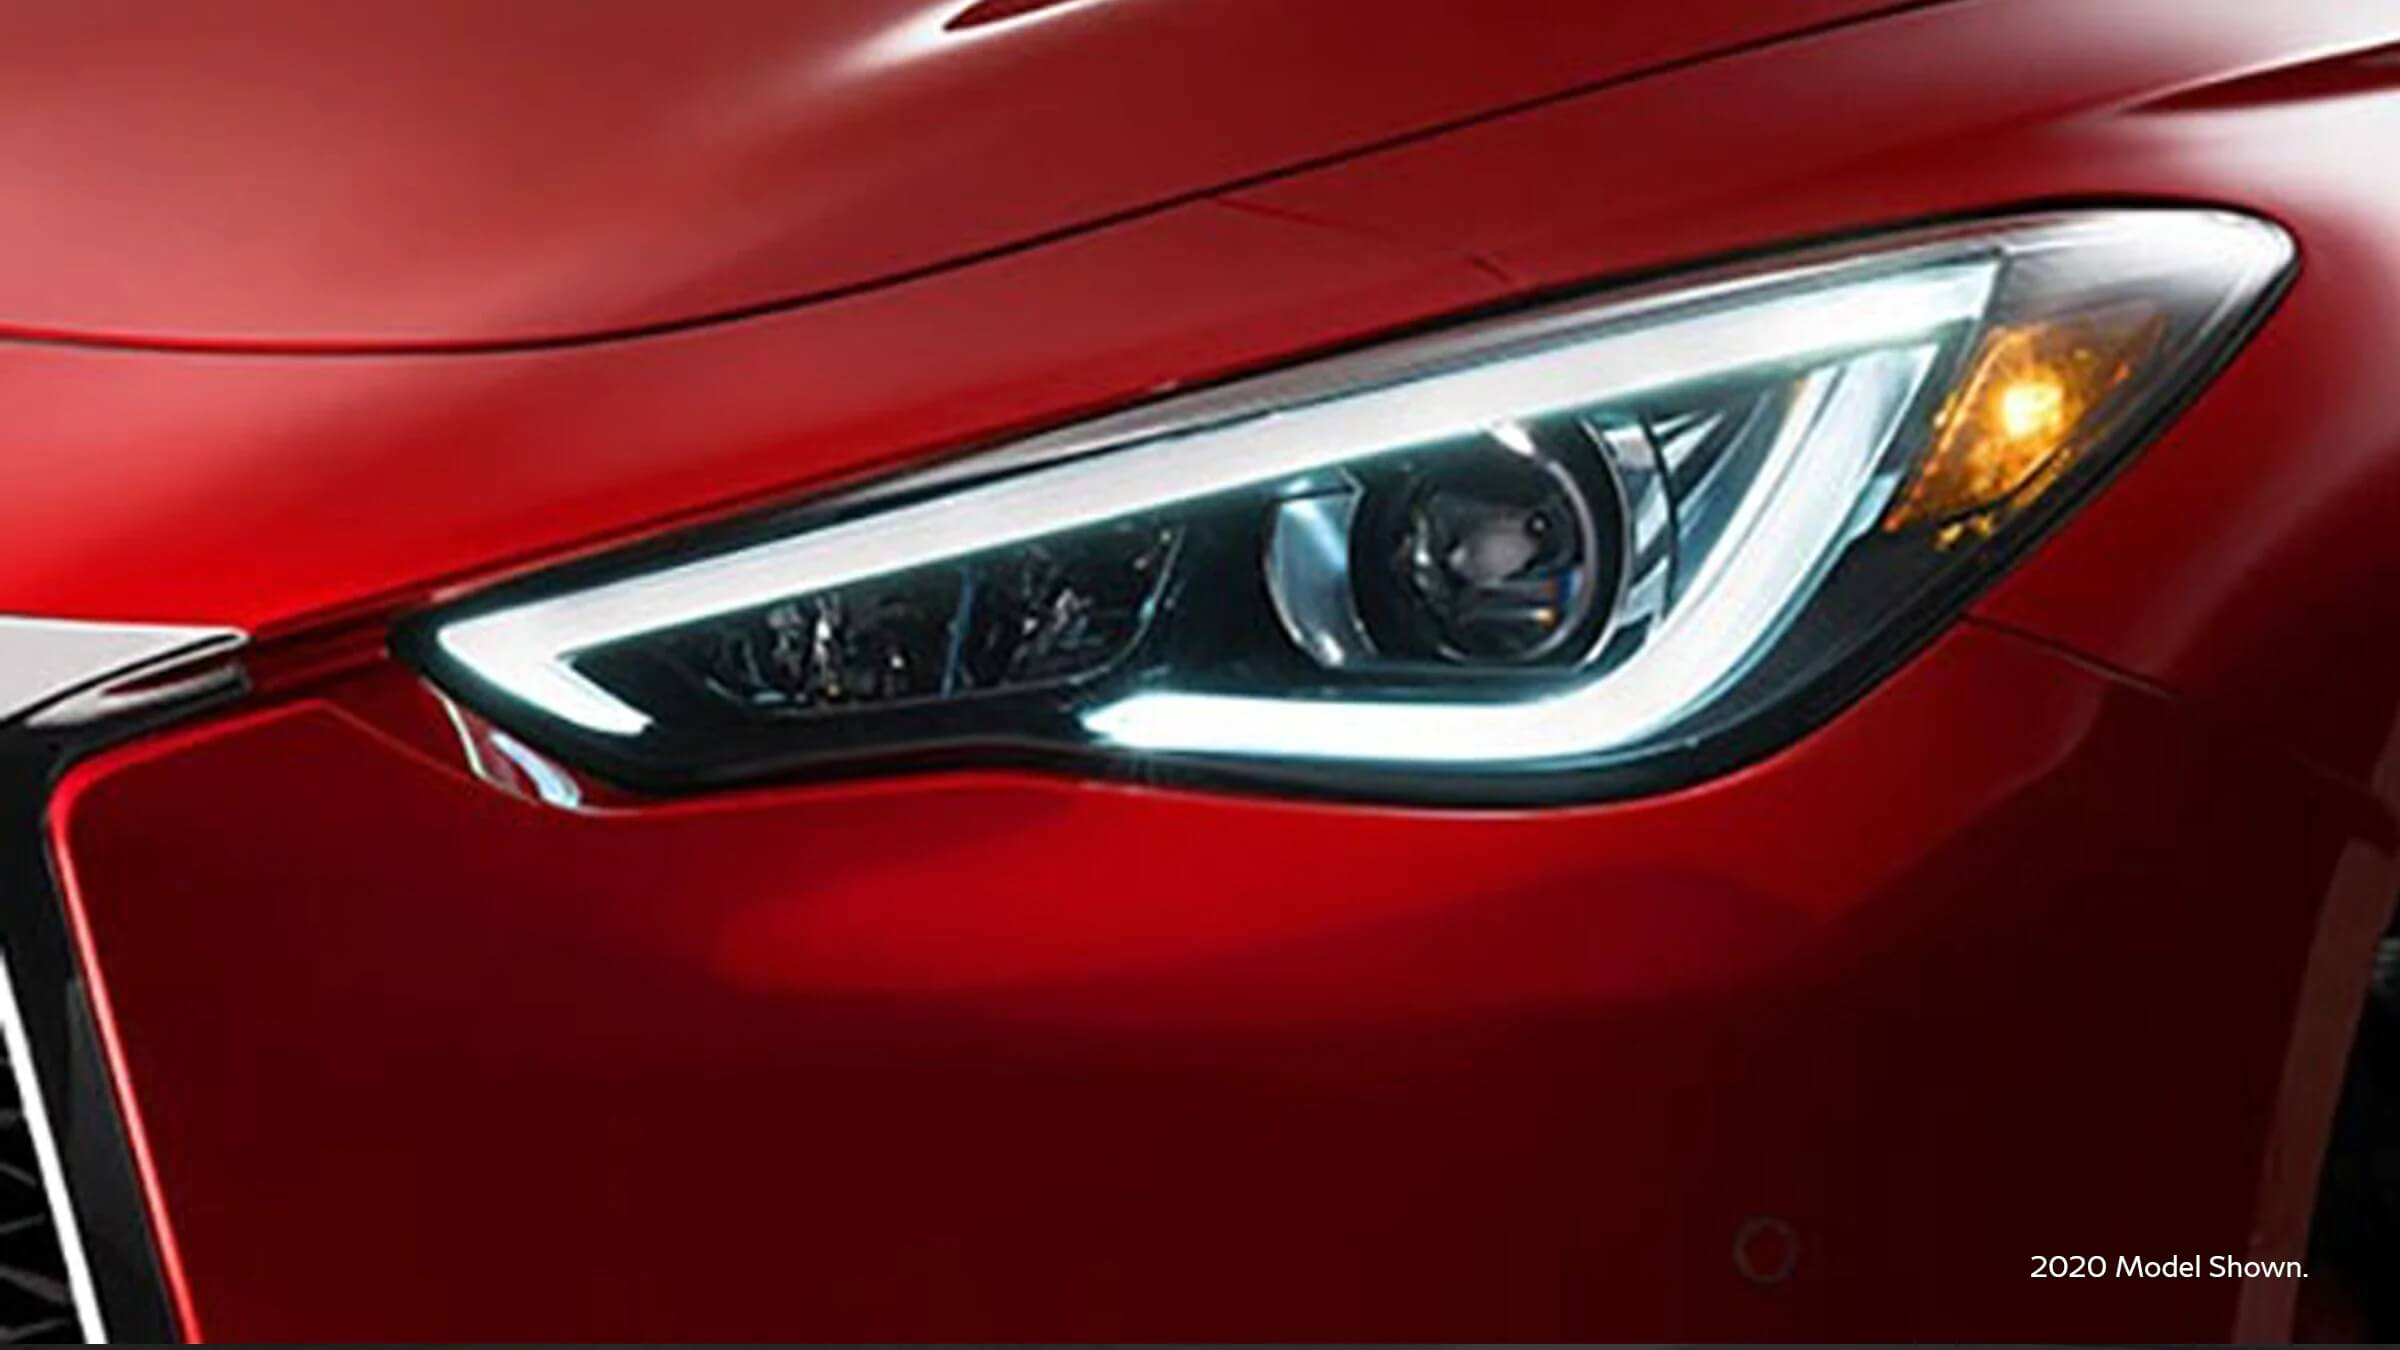 2021 Infiniti Q60 with eye inspired LED headlights